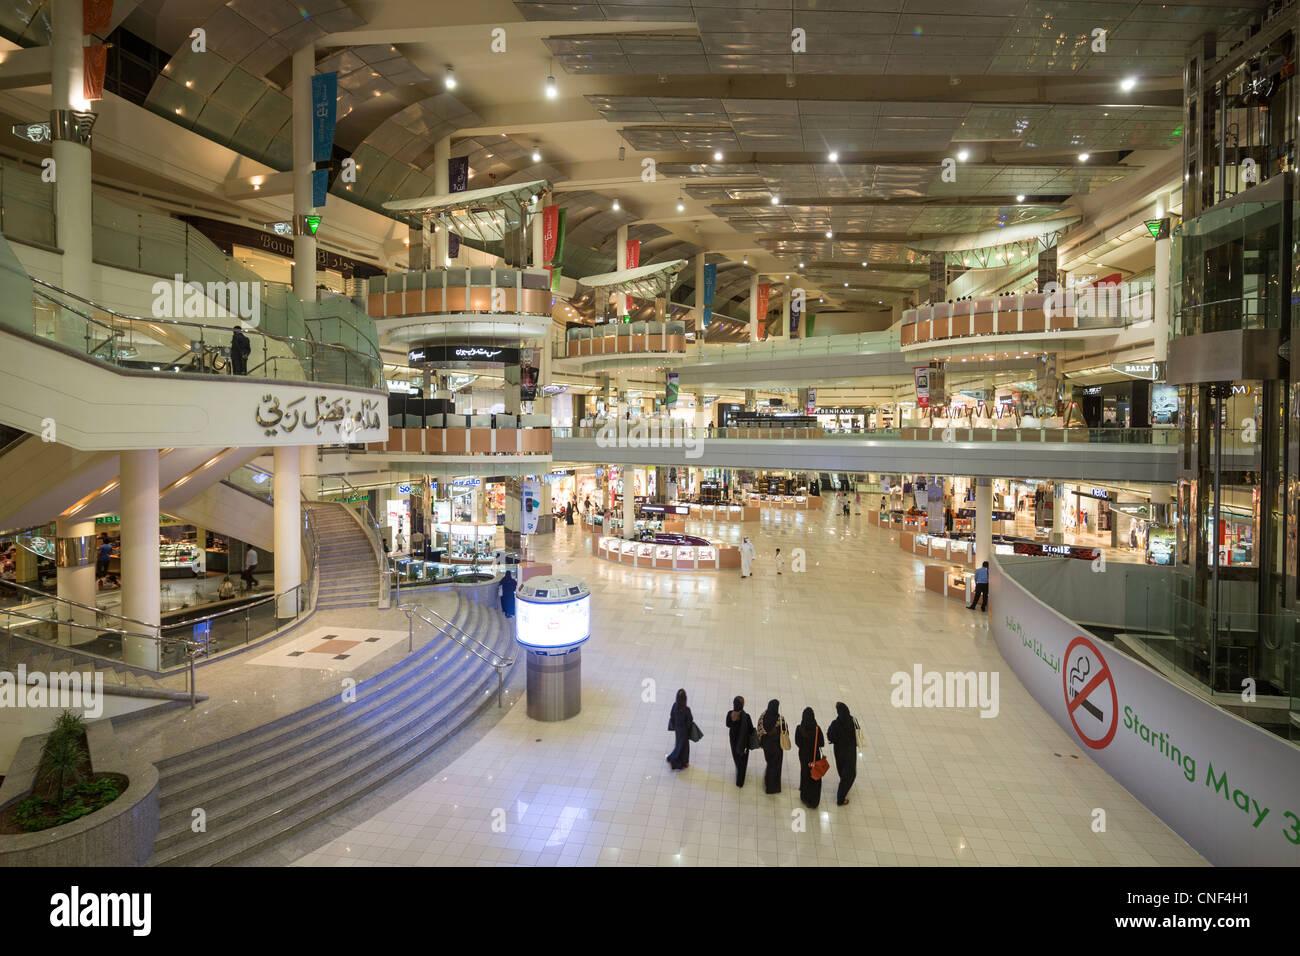 shopping mall, Kingdom Tower/Center, Riyadh, Saudi Arabia - Stock Image